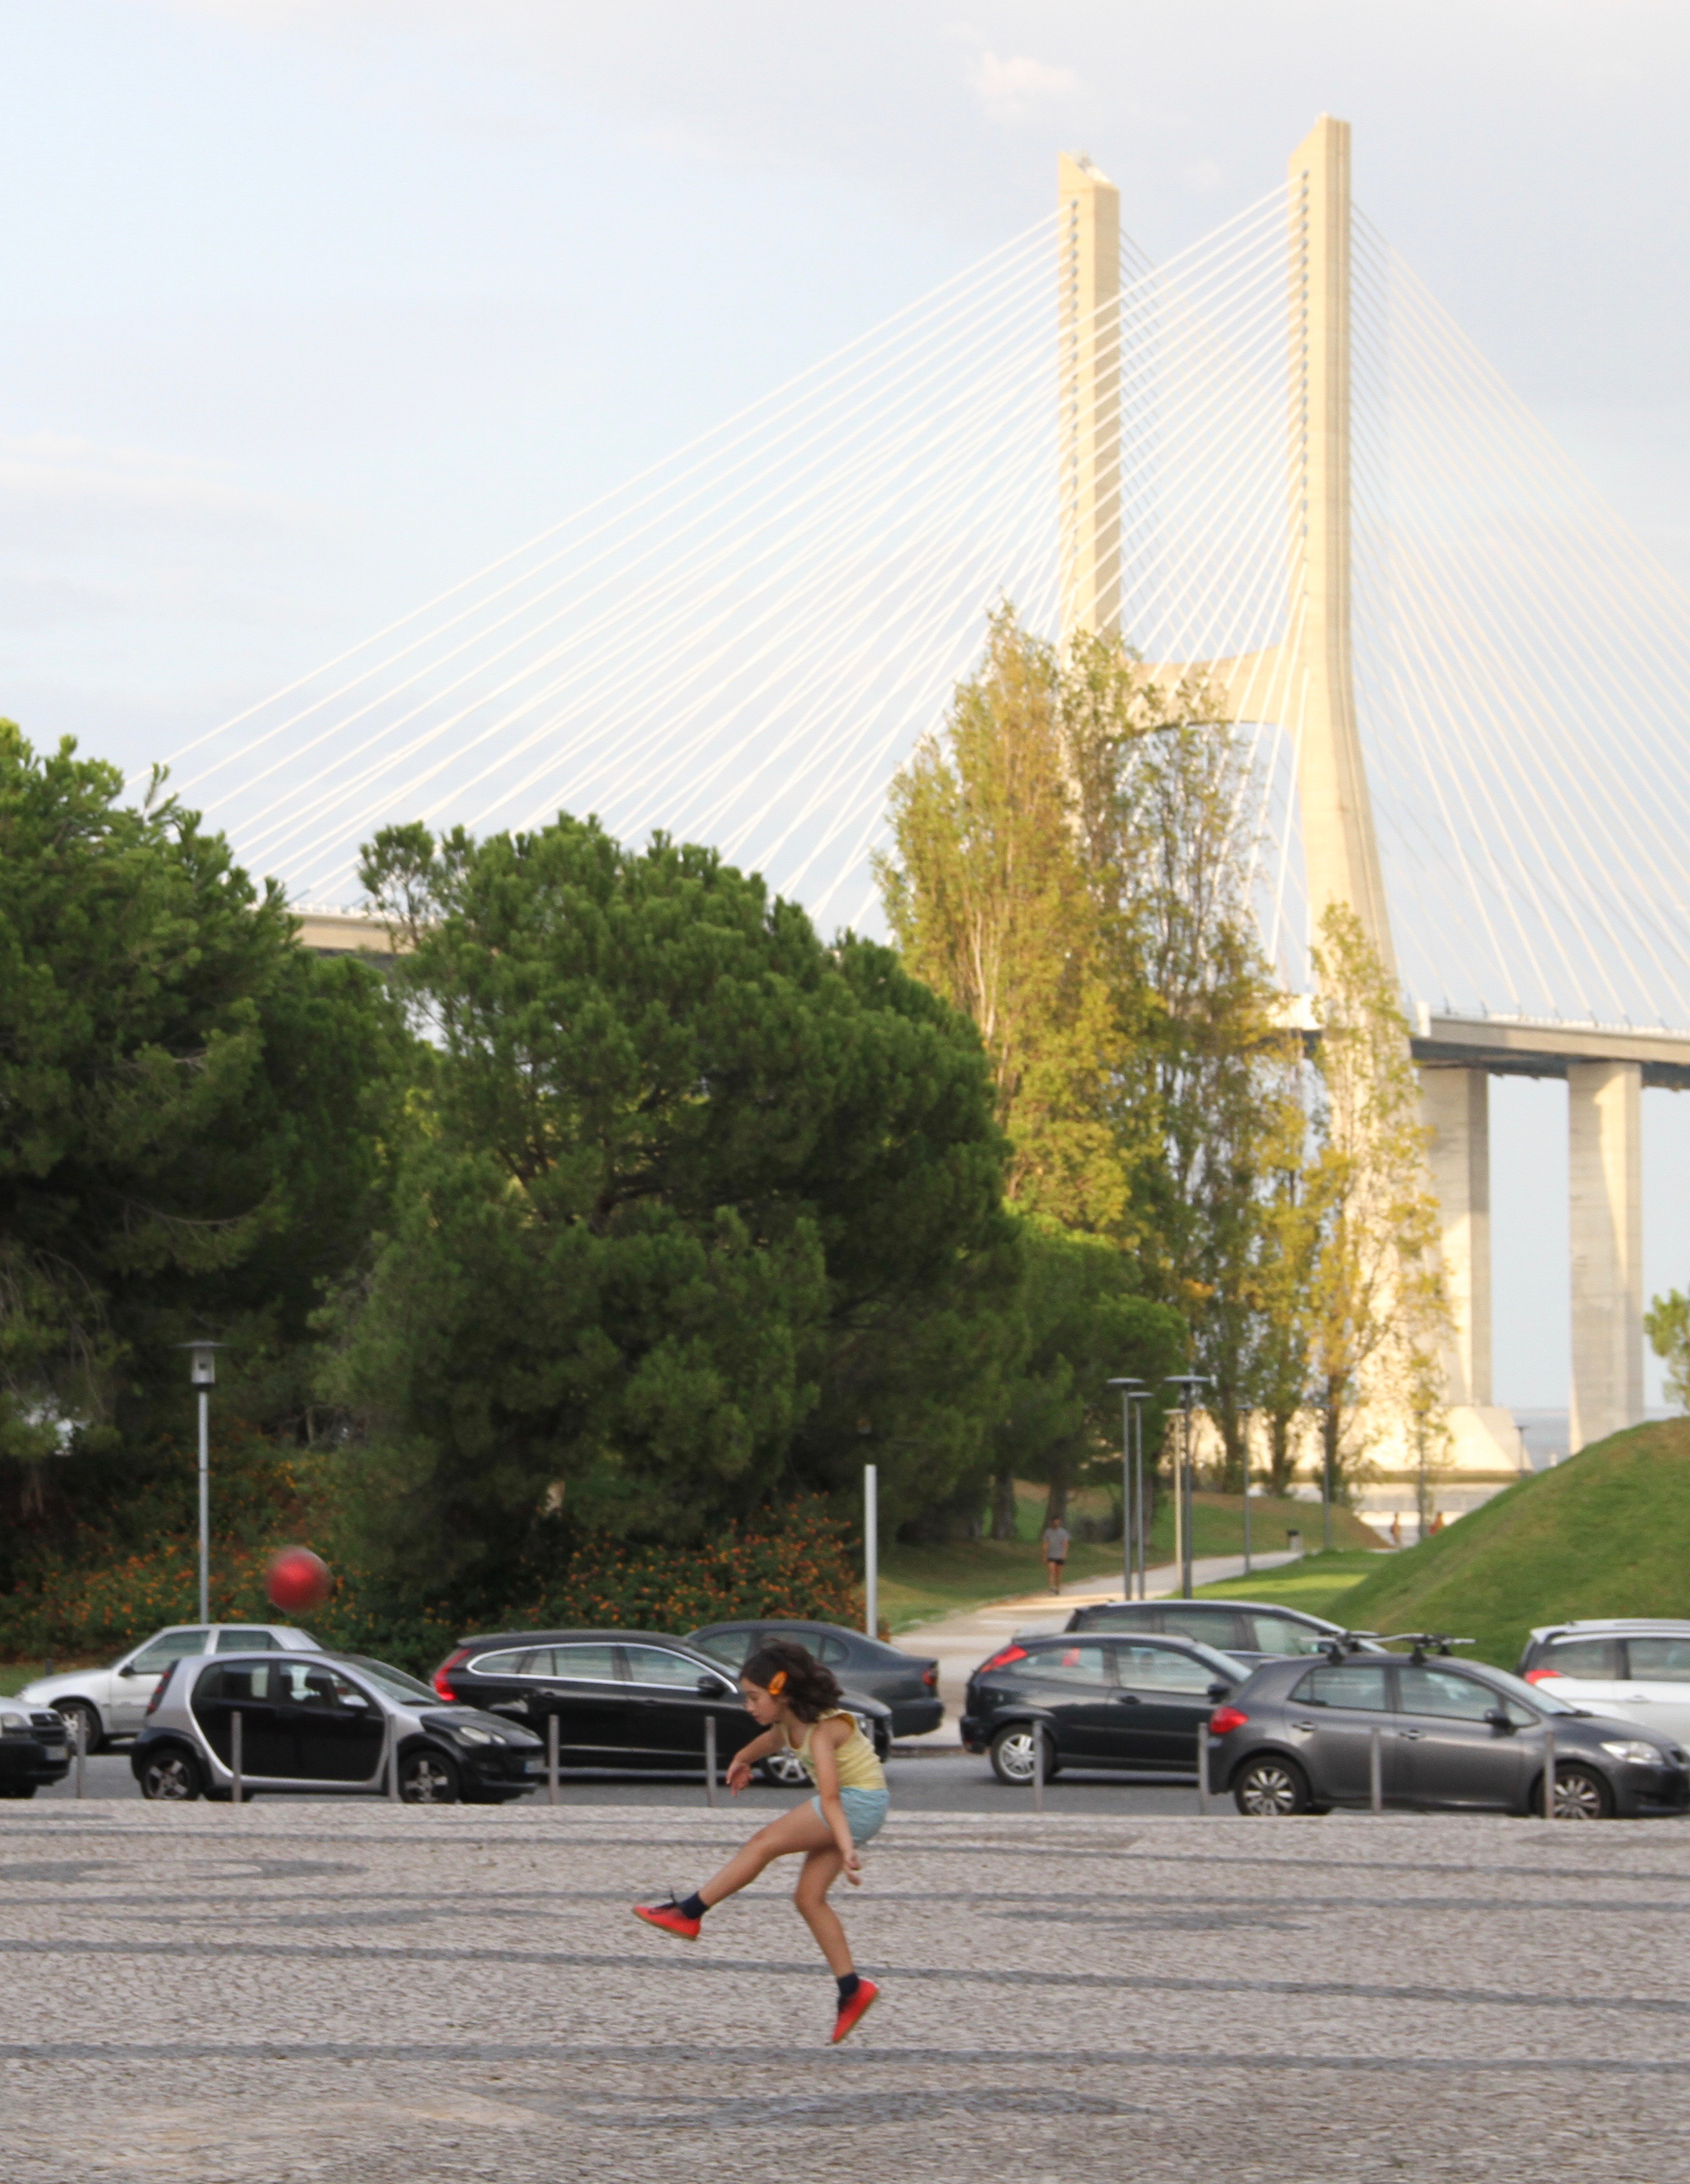 A young girl kicks a soccer ball in a plaza near the Ponte Vasco da Gama Bridge over the Tagus River on Saturday, Sept. 14, 2019.